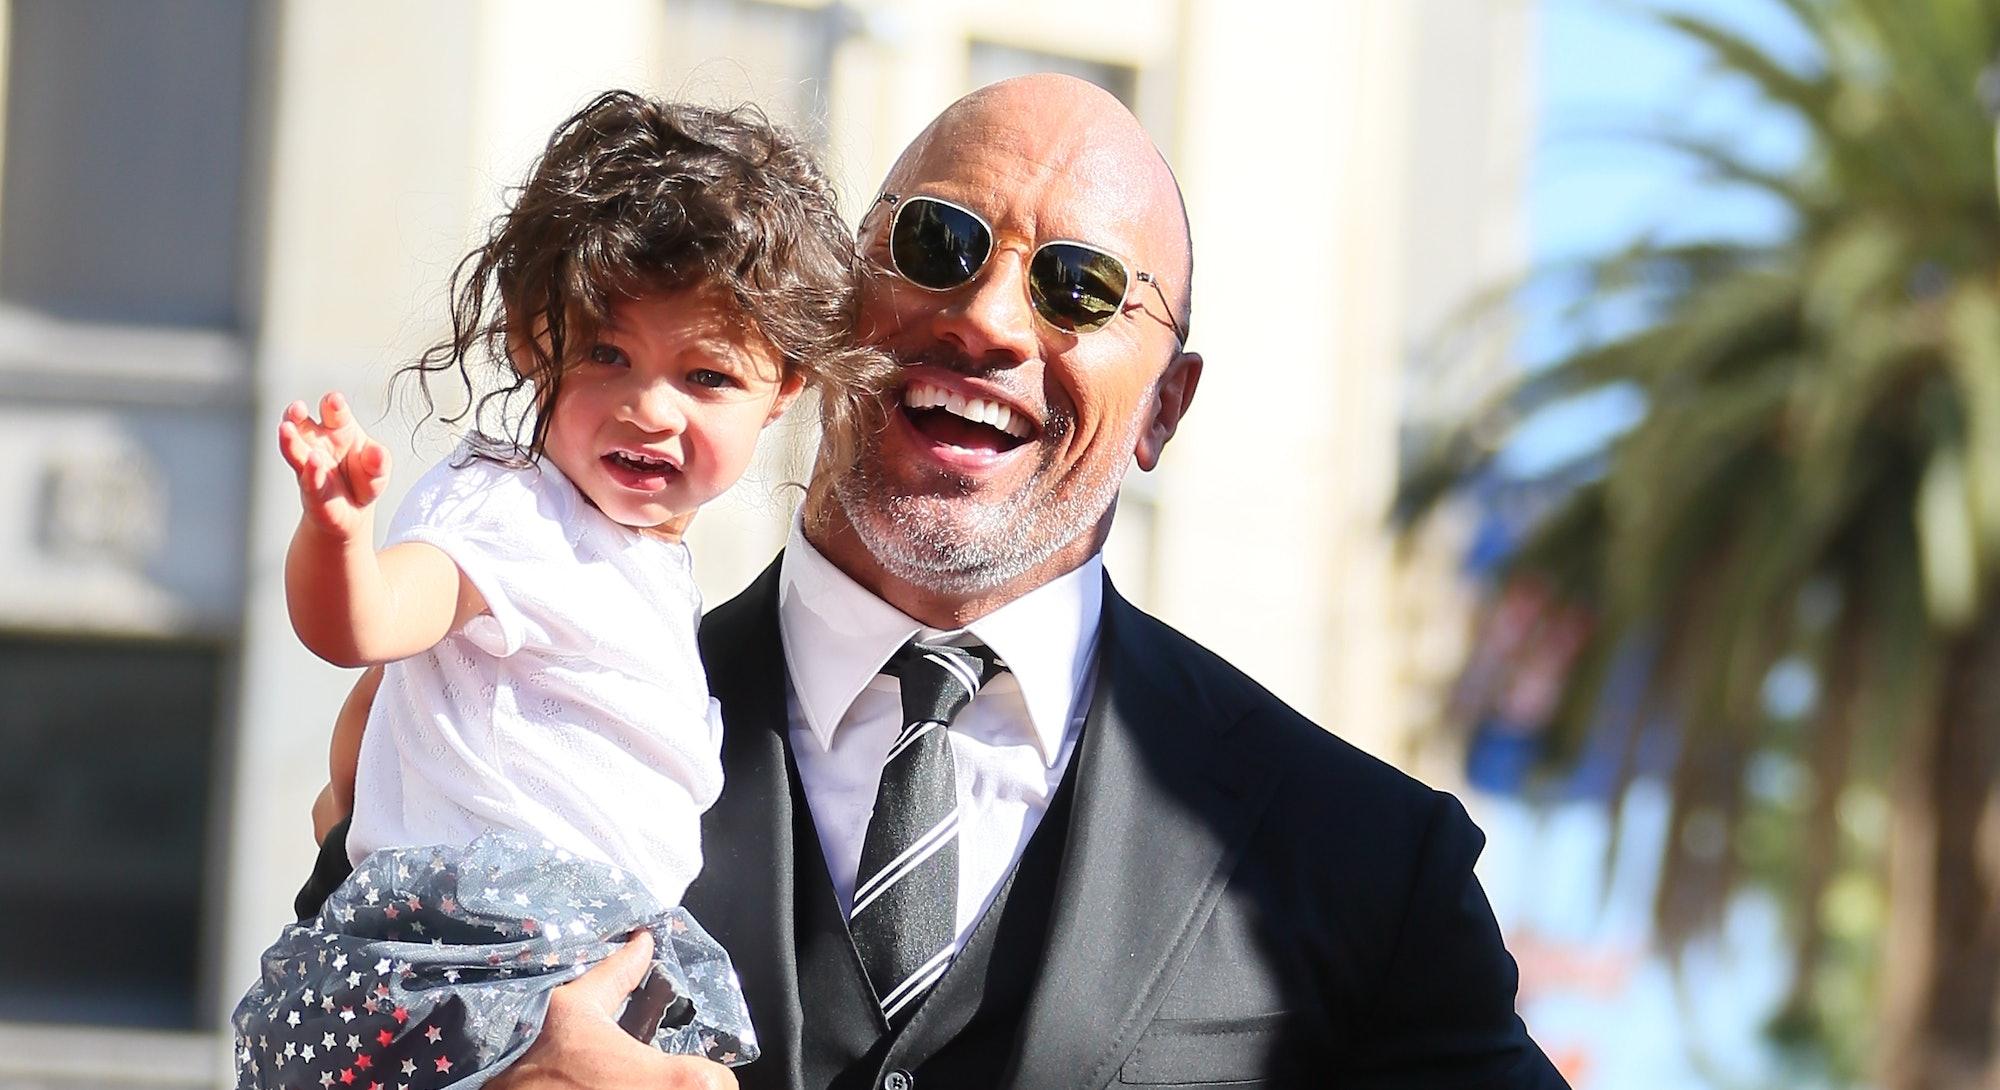 LOS ANGELES, CA - DECEMBER 13: Dwayne Johnson and daughter Jasmine Johnson attends a ceremony honori...